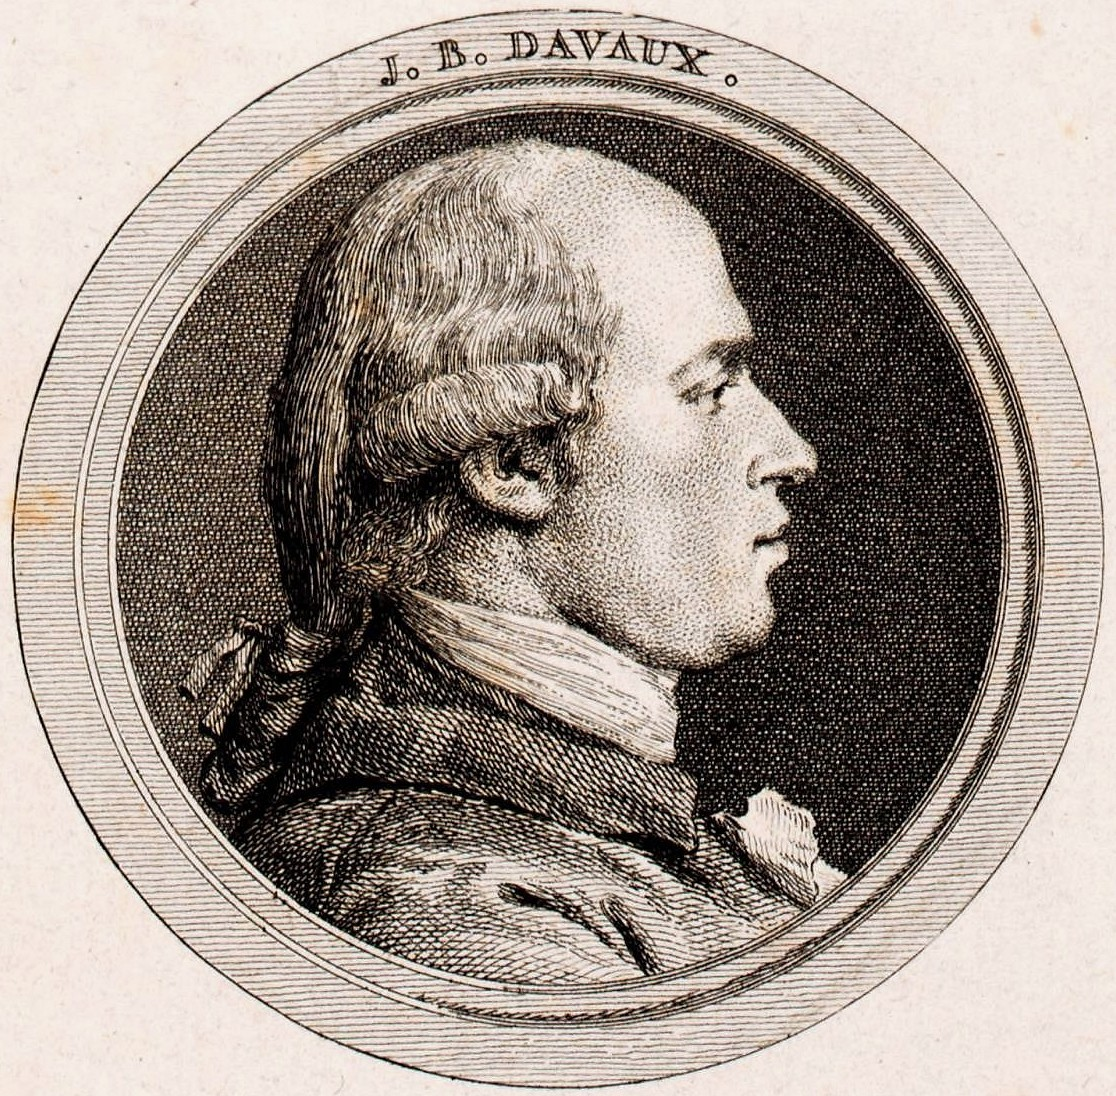 Jean Baptiste Davaux Wikipdia